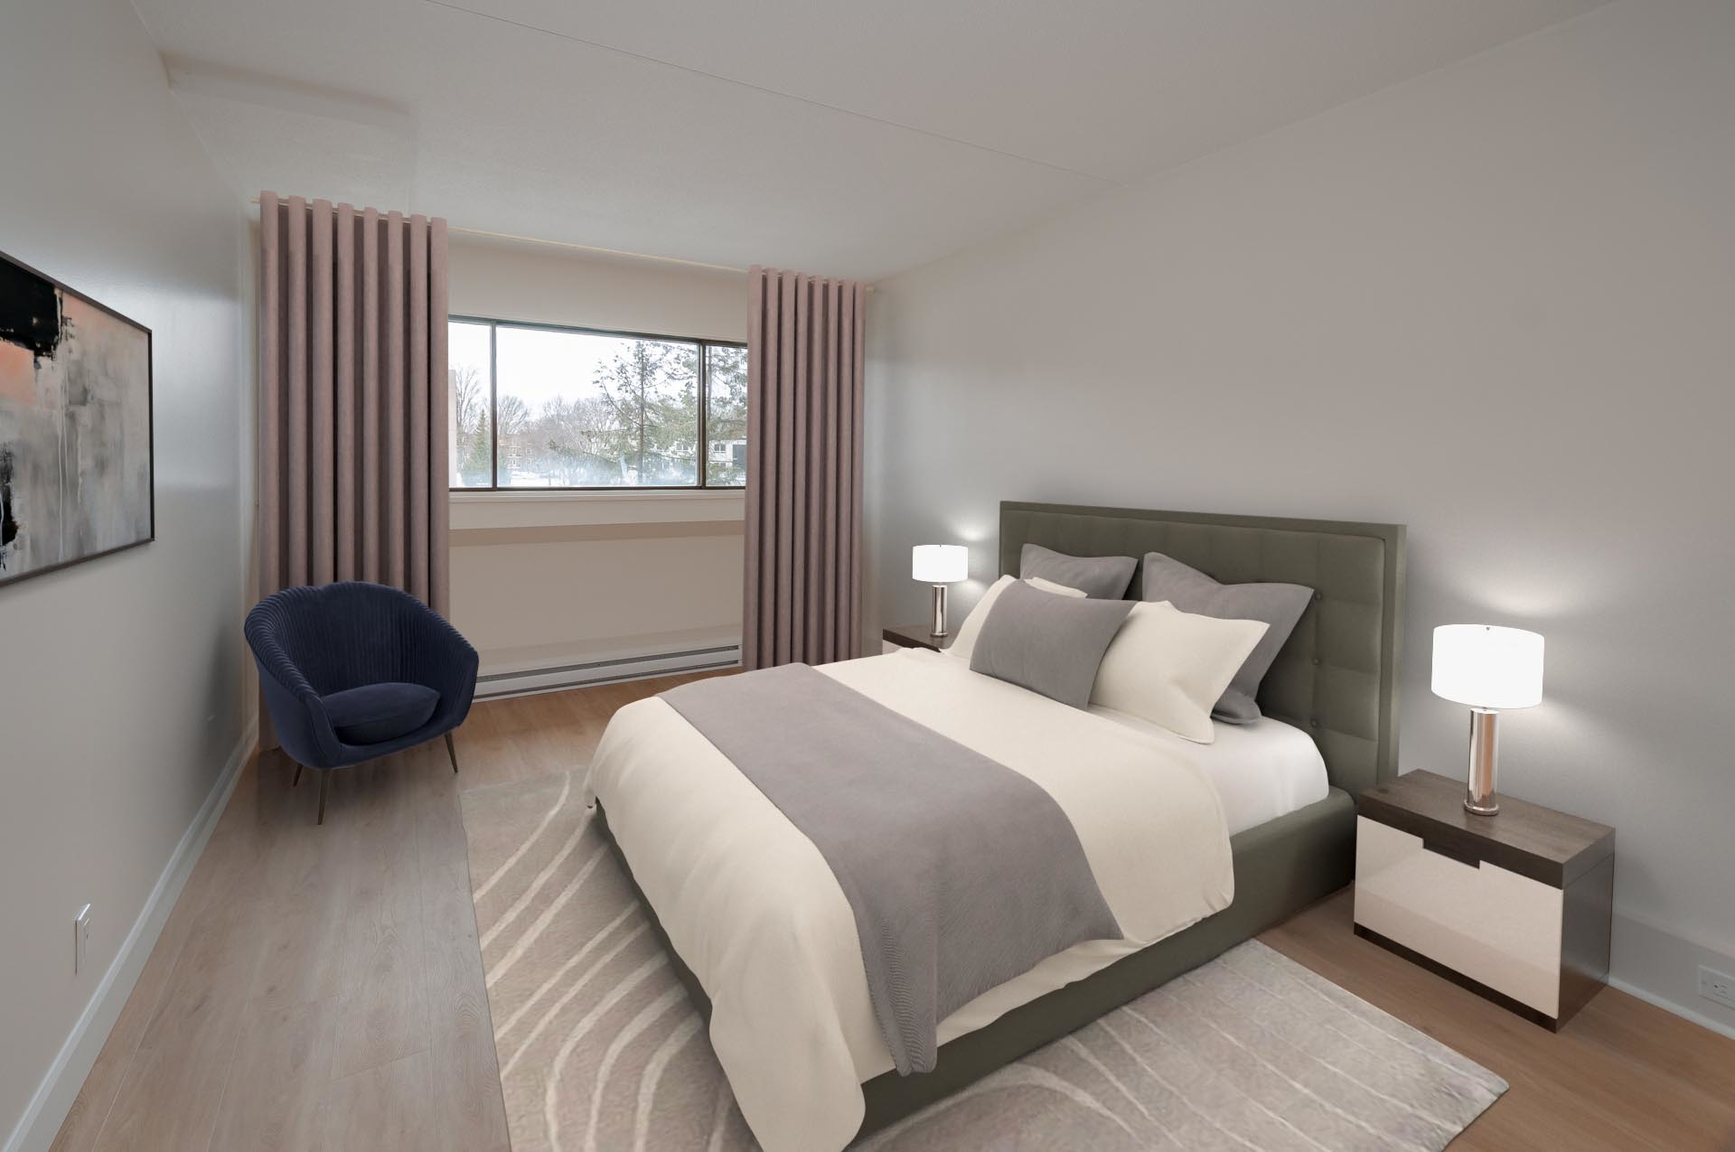 1 bedroom Apartments for rent in Quebec City at Les Jardins de Merici - Photo 17 - RentersPages – L407121